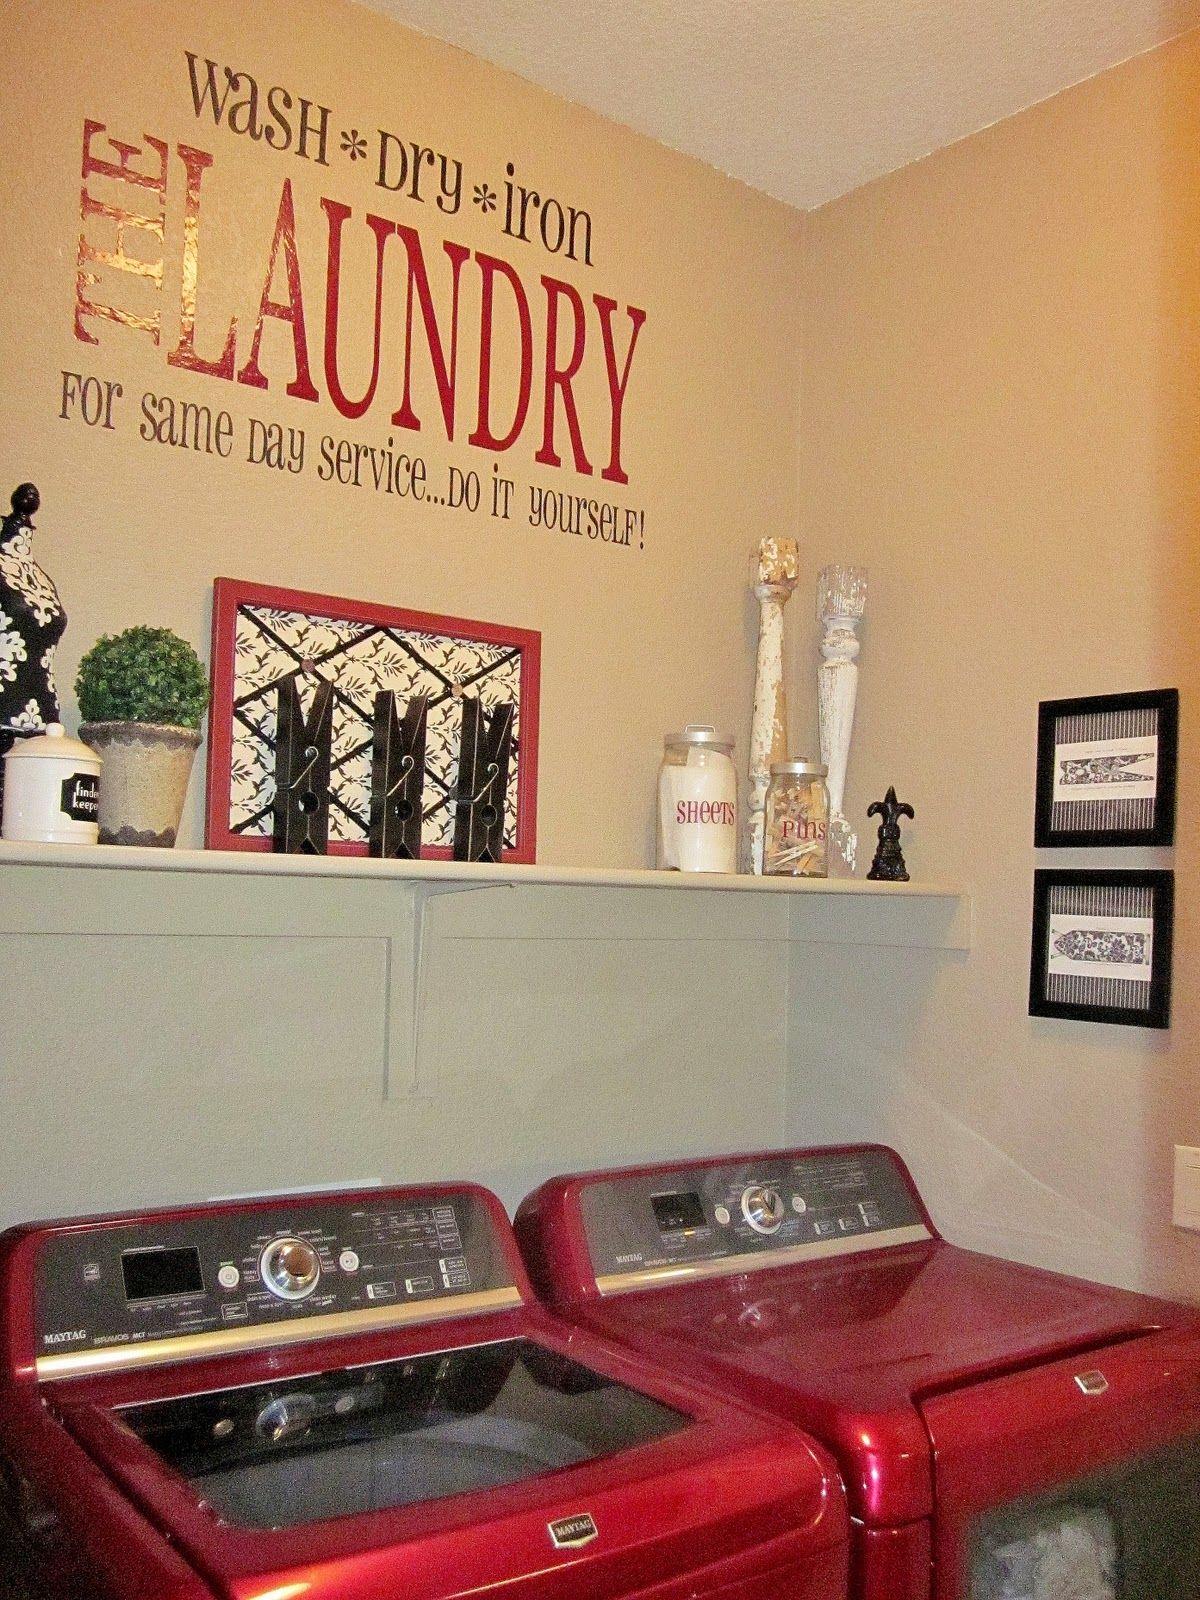 Adorable Antics Laundry Room Decorations On No Budget Laundry Room Decor Laundry Room Laundry Decor